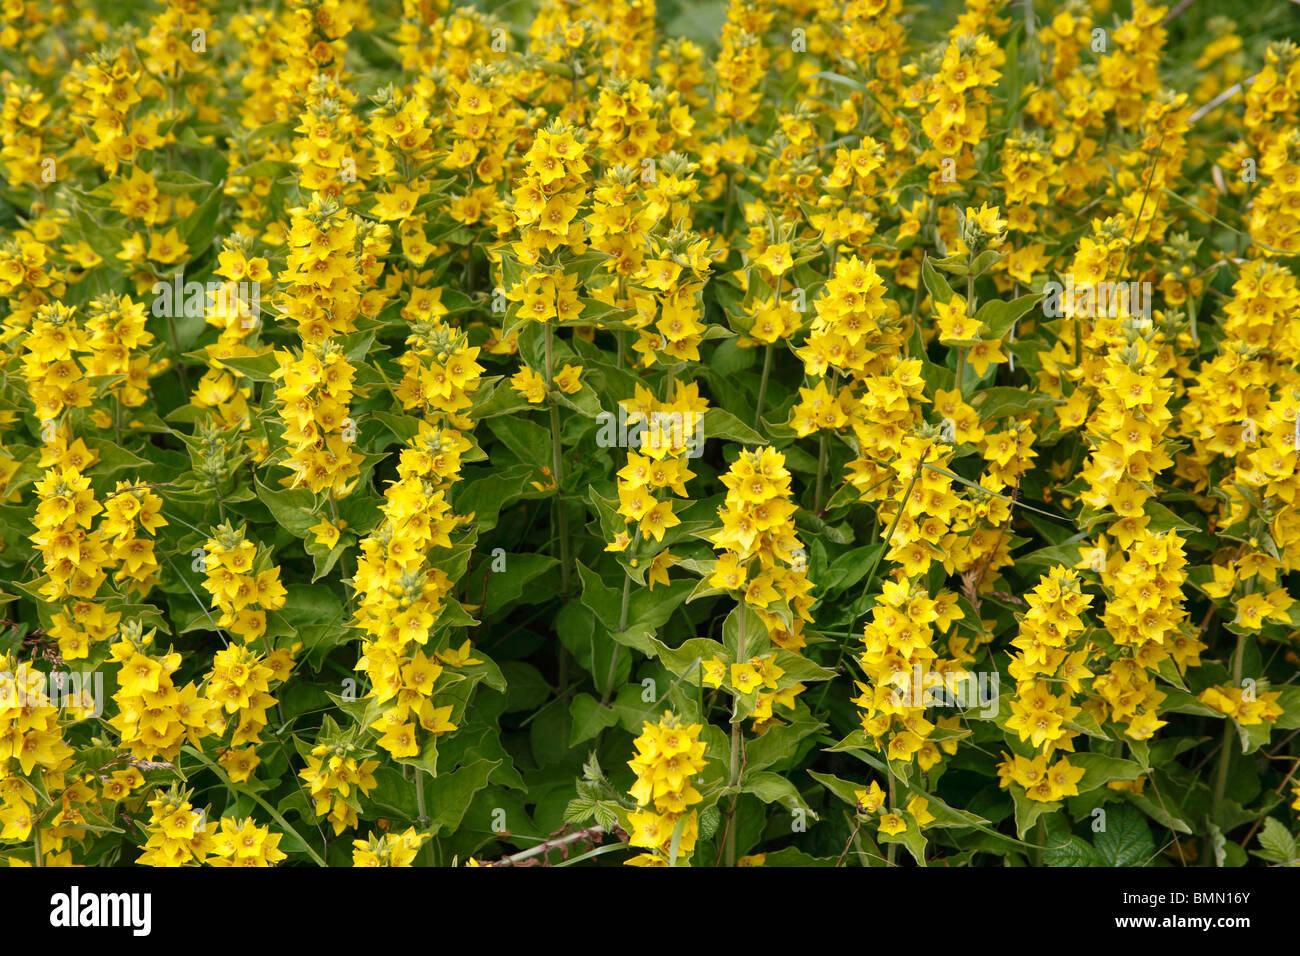 Yellow loosestrife stock photos yellow loosestrife stock images yellow loosestrife lysimachia punctata plants in flower stock image mightylinksfo